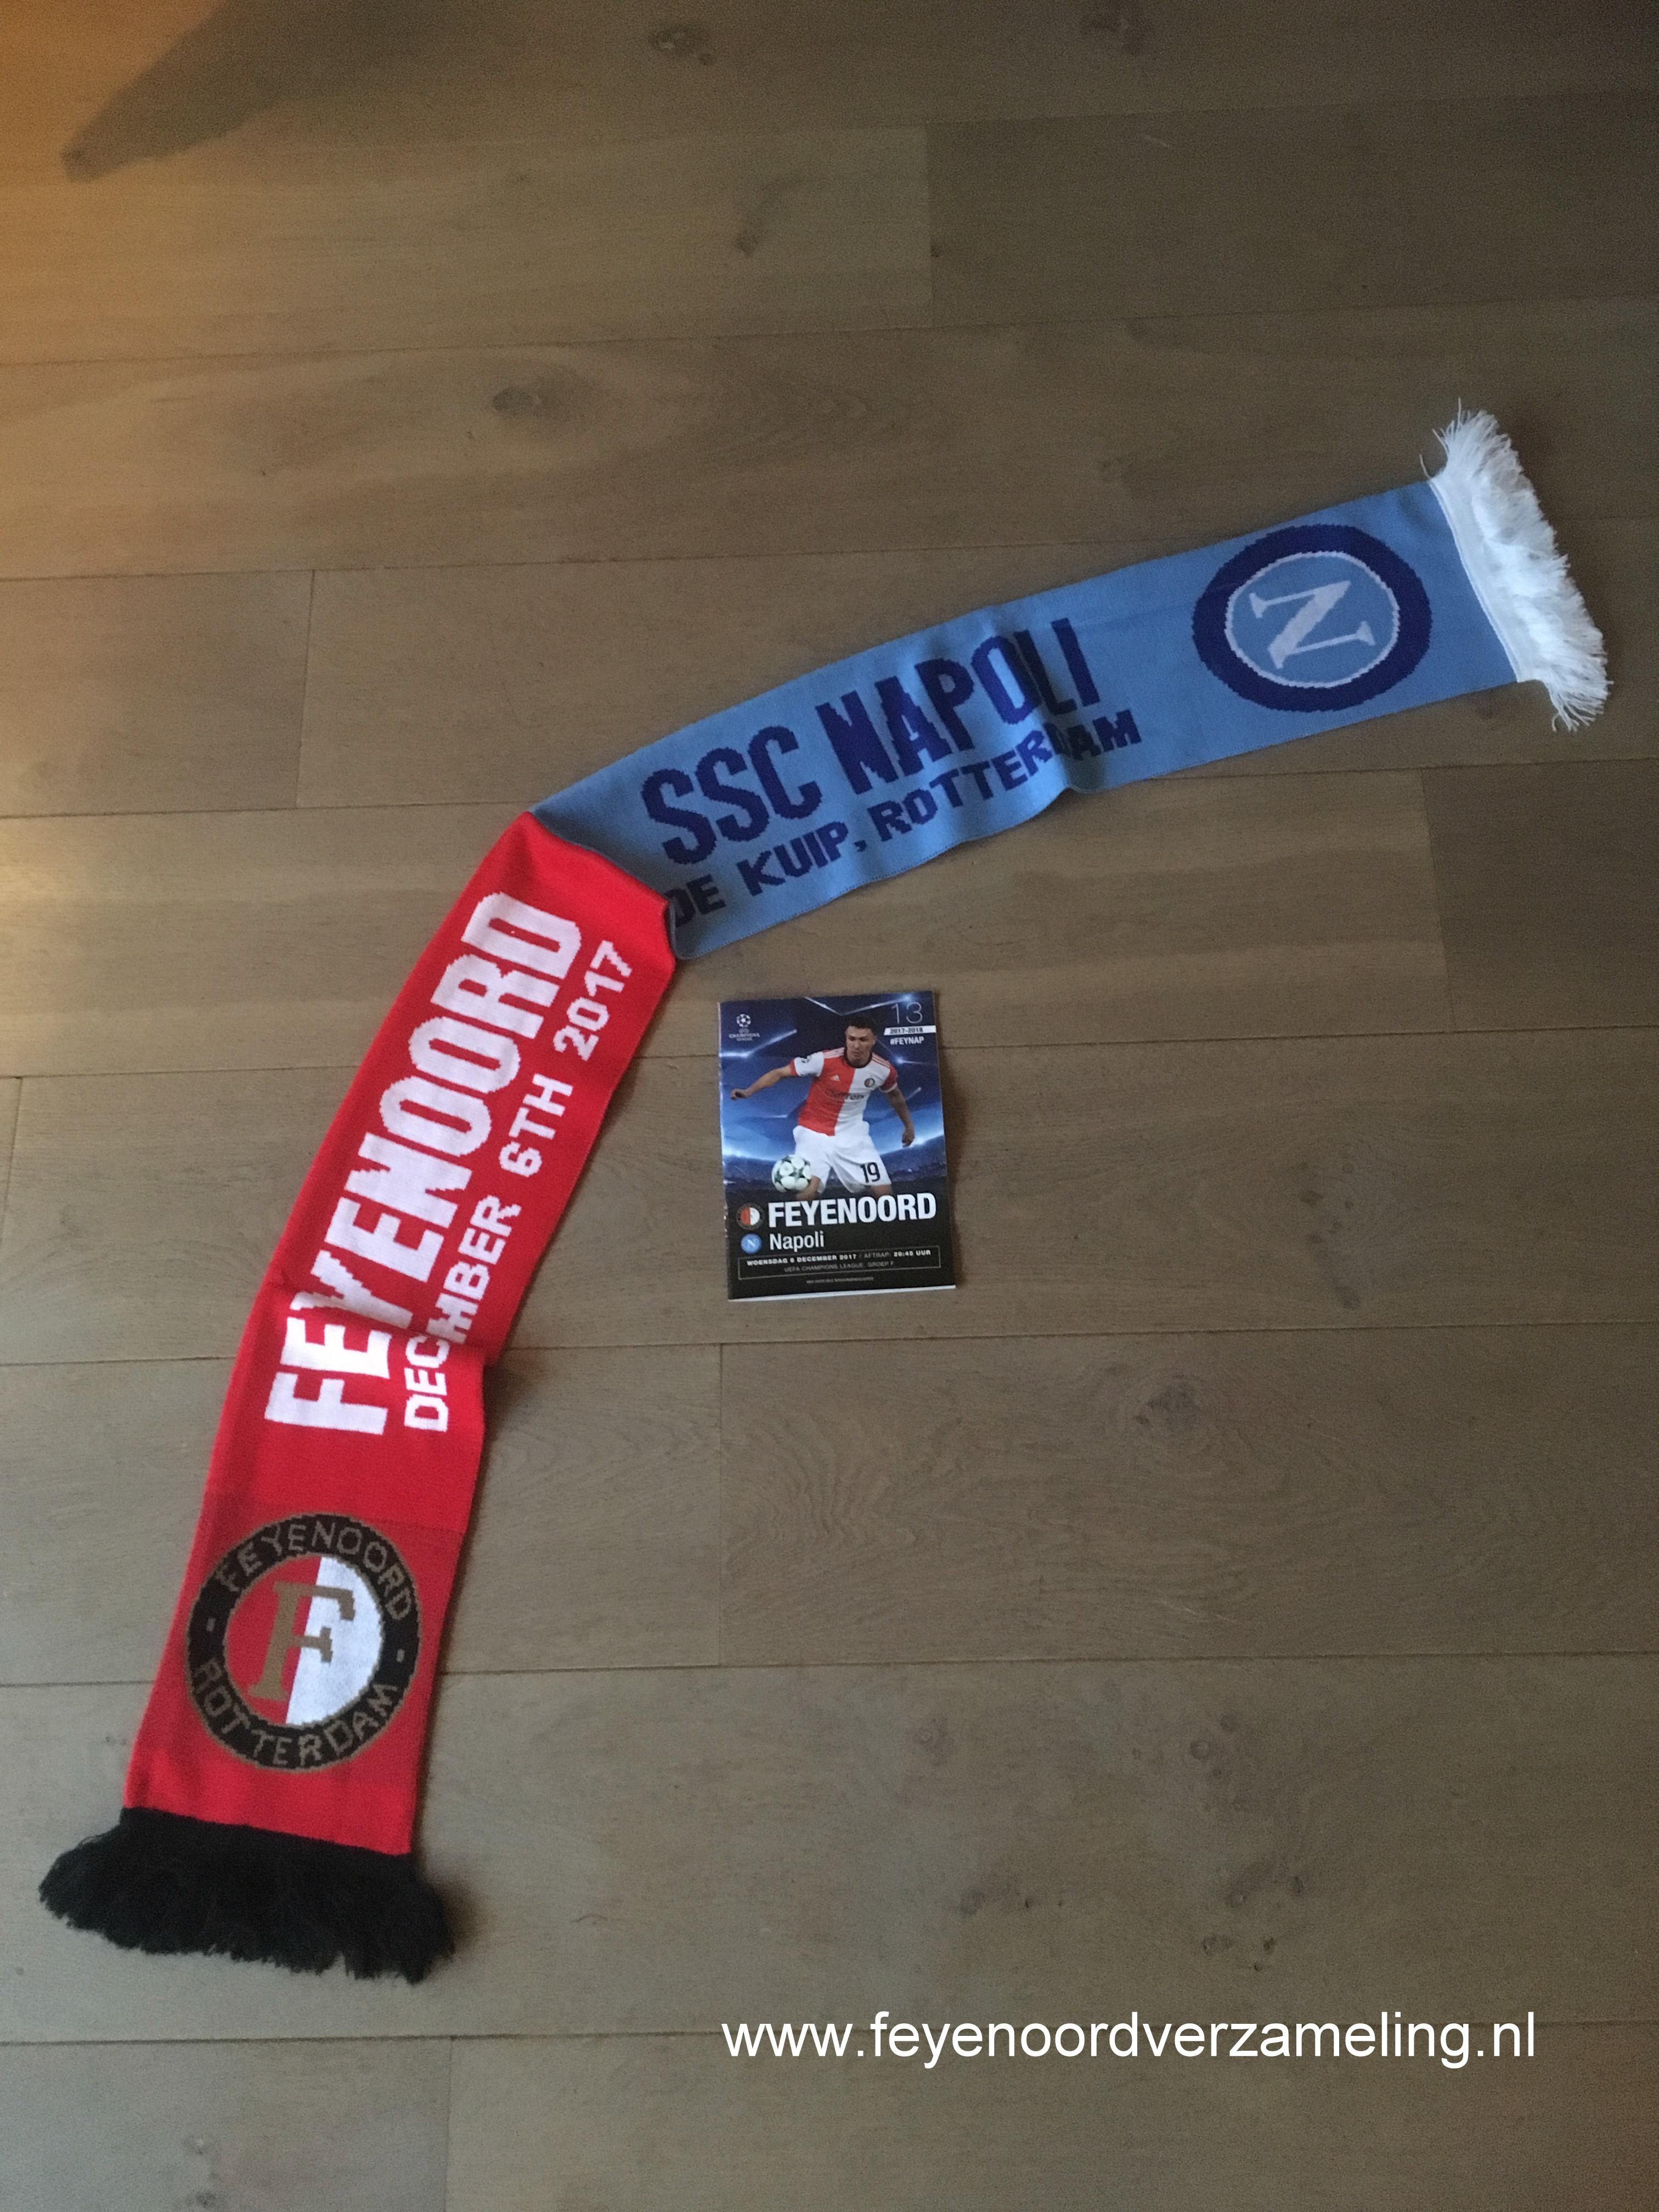 Feyenoord - Napoli CL 6-12-2017